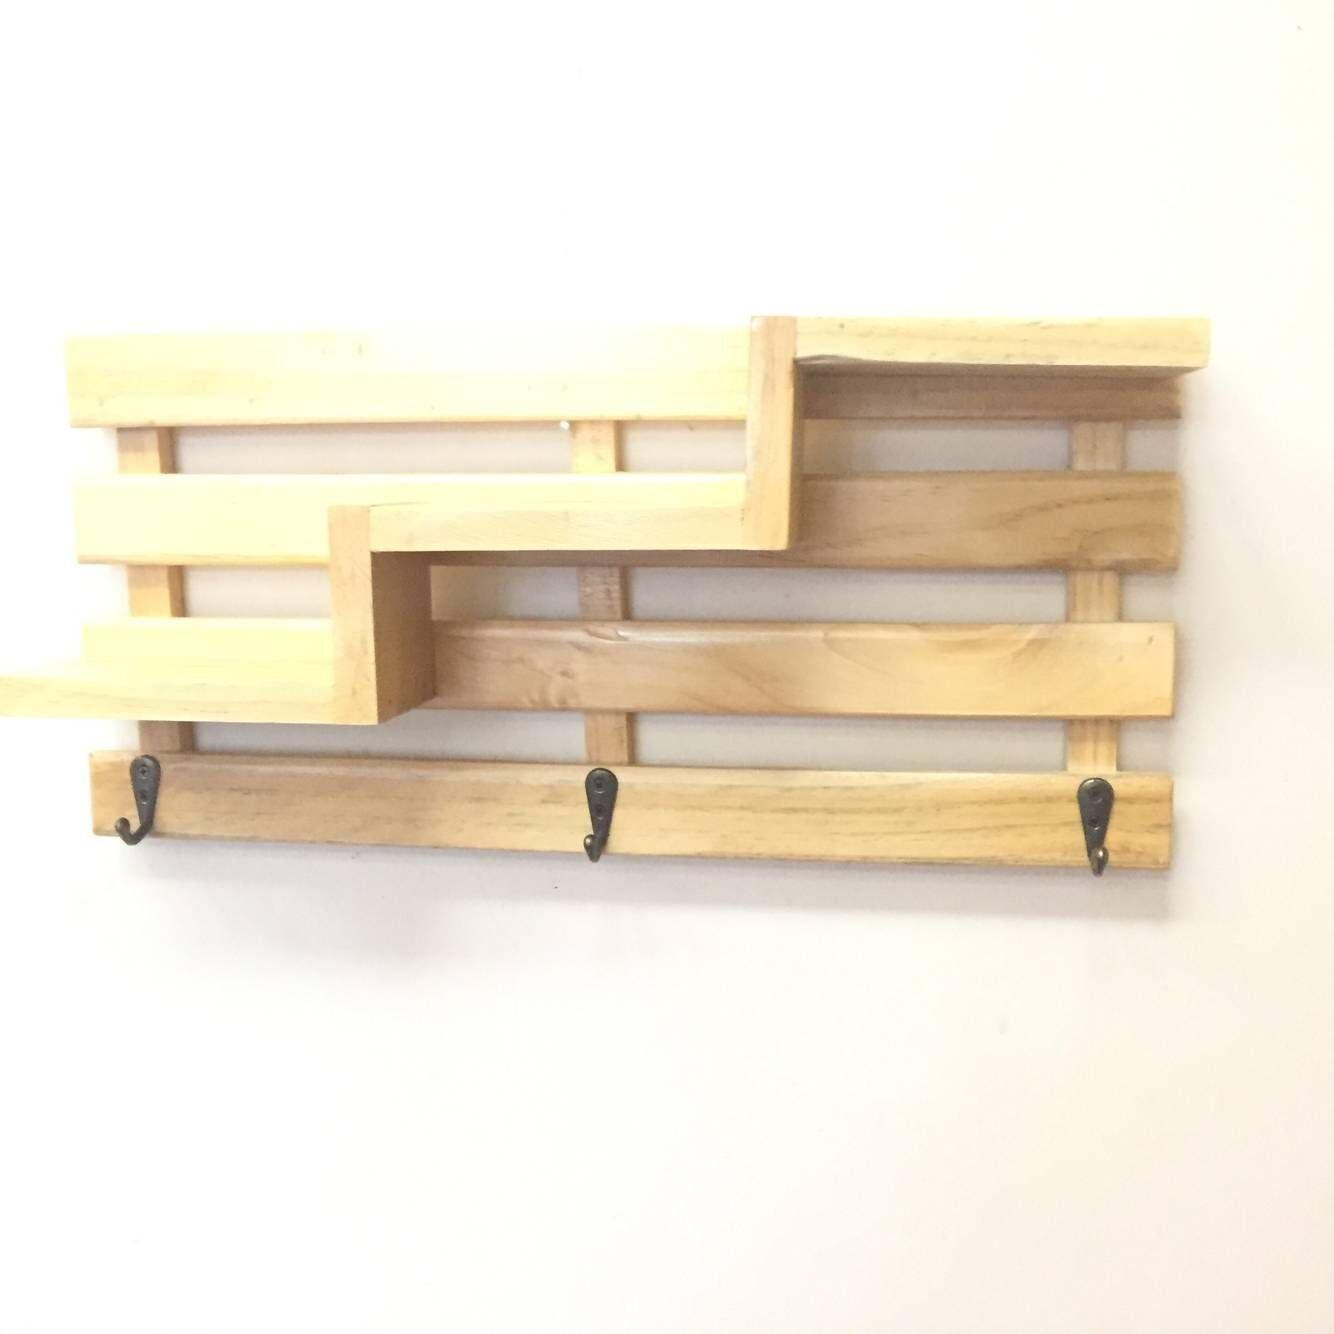 Unique Wooden Key Wall Decor Adornment - The Wall Art Decorations ...